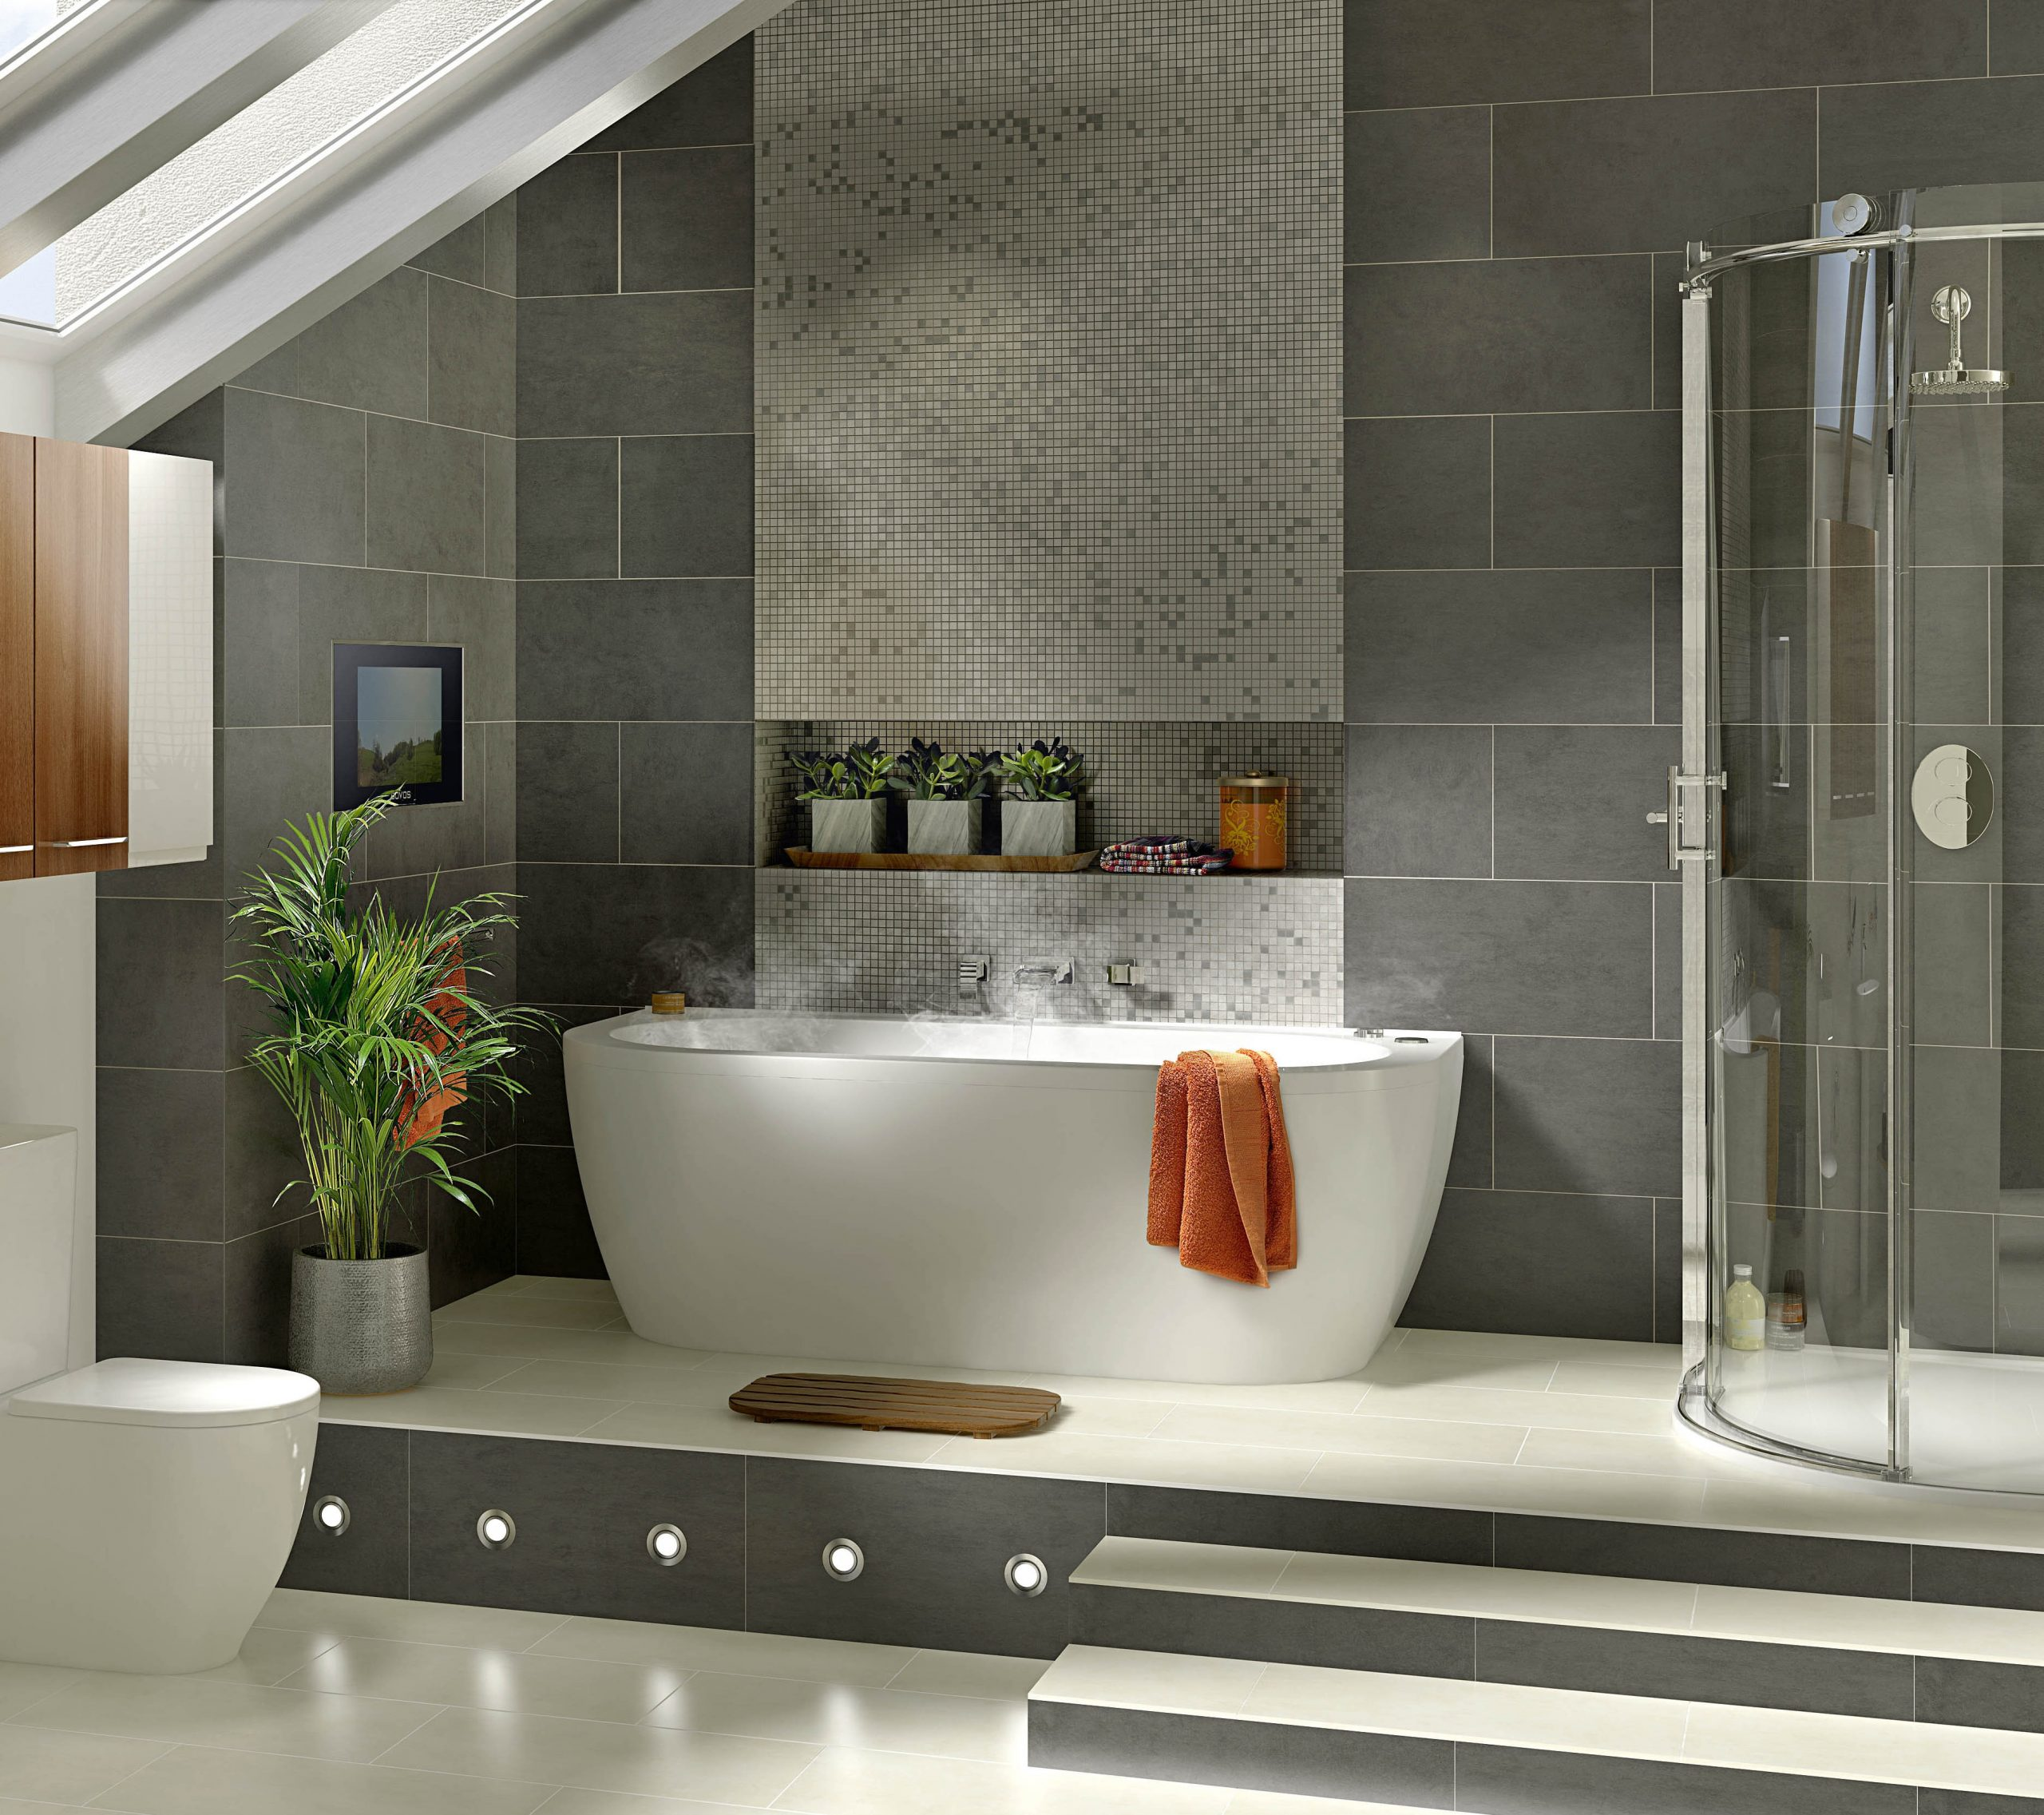 ديكورات حمامات فاخرة 9 1